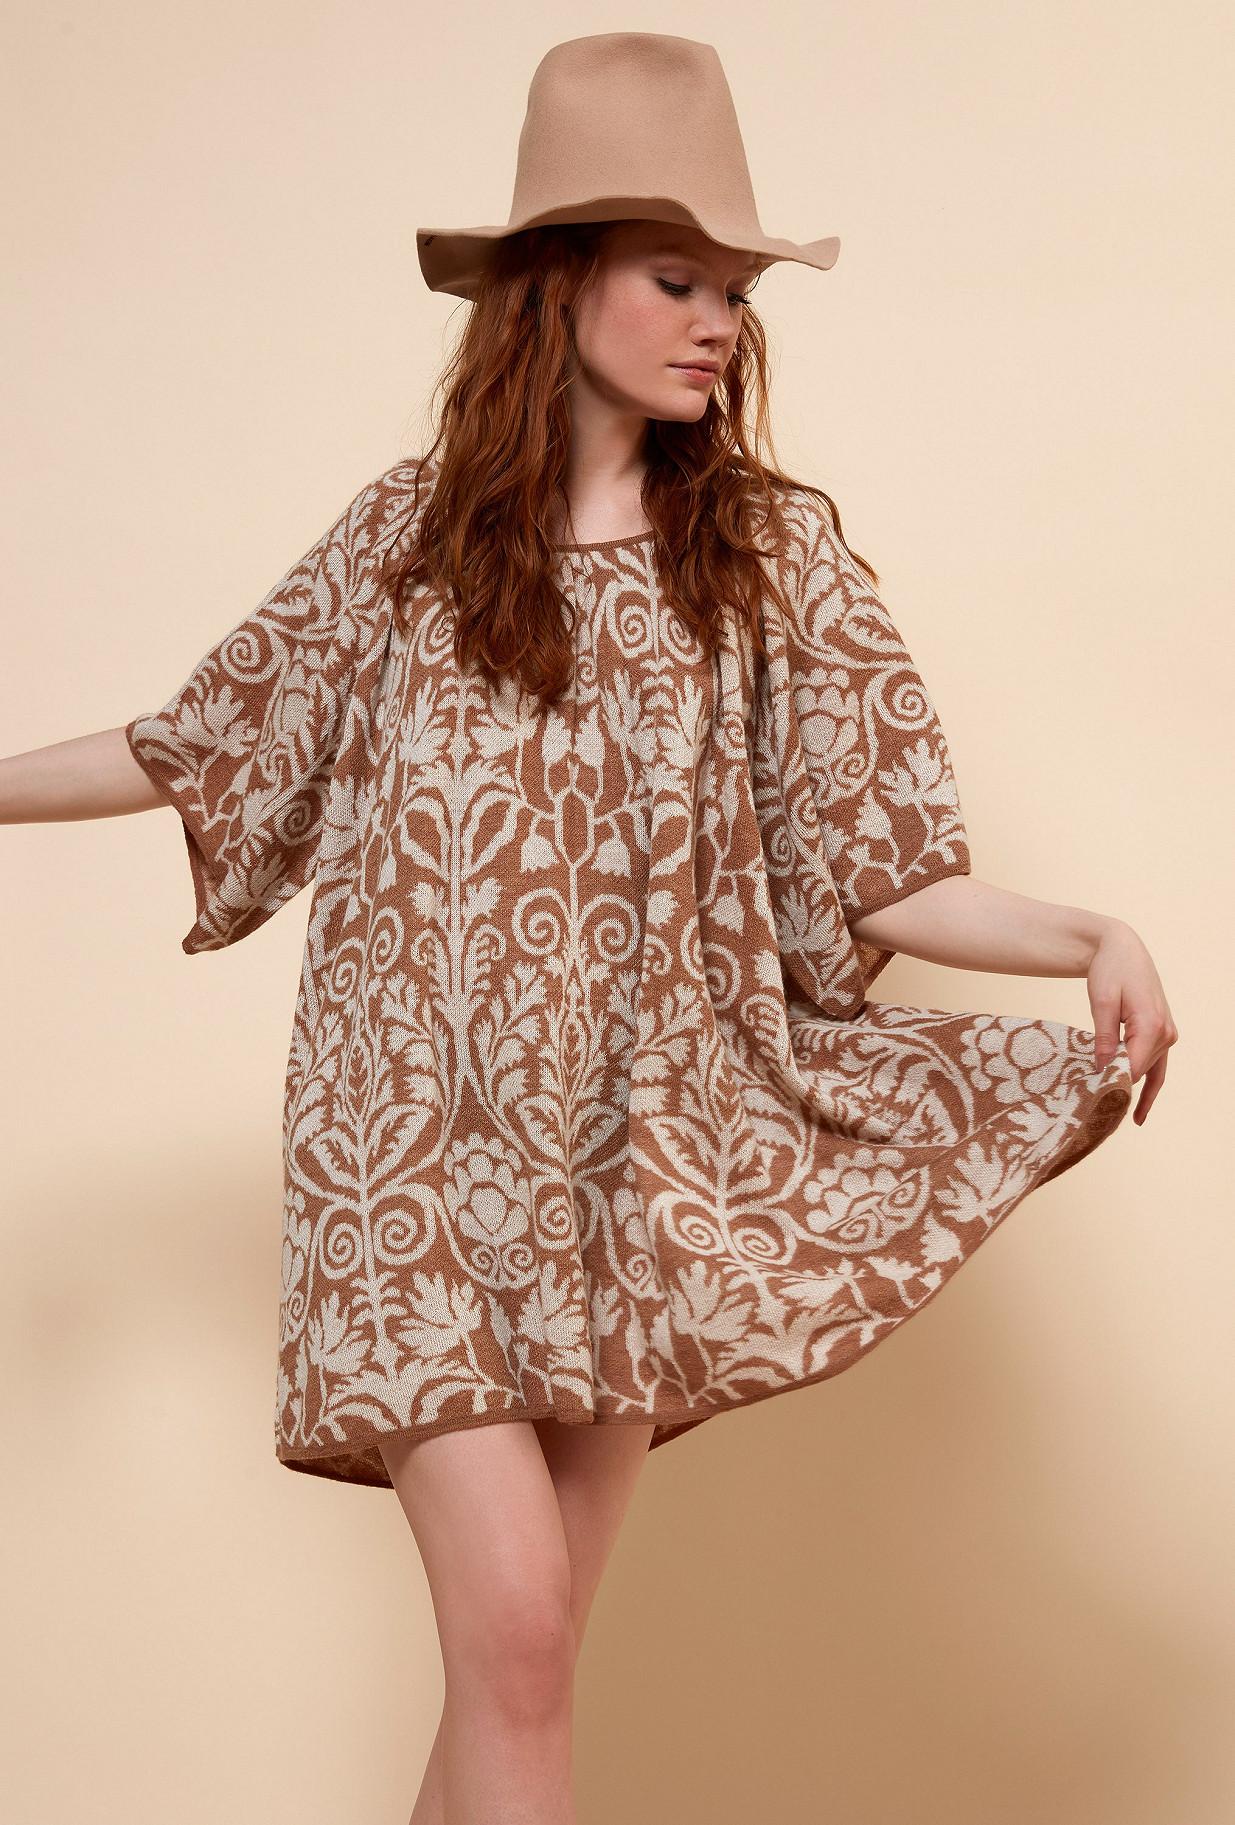 Paris clothes store Knit  Yami french designer fashion Paris